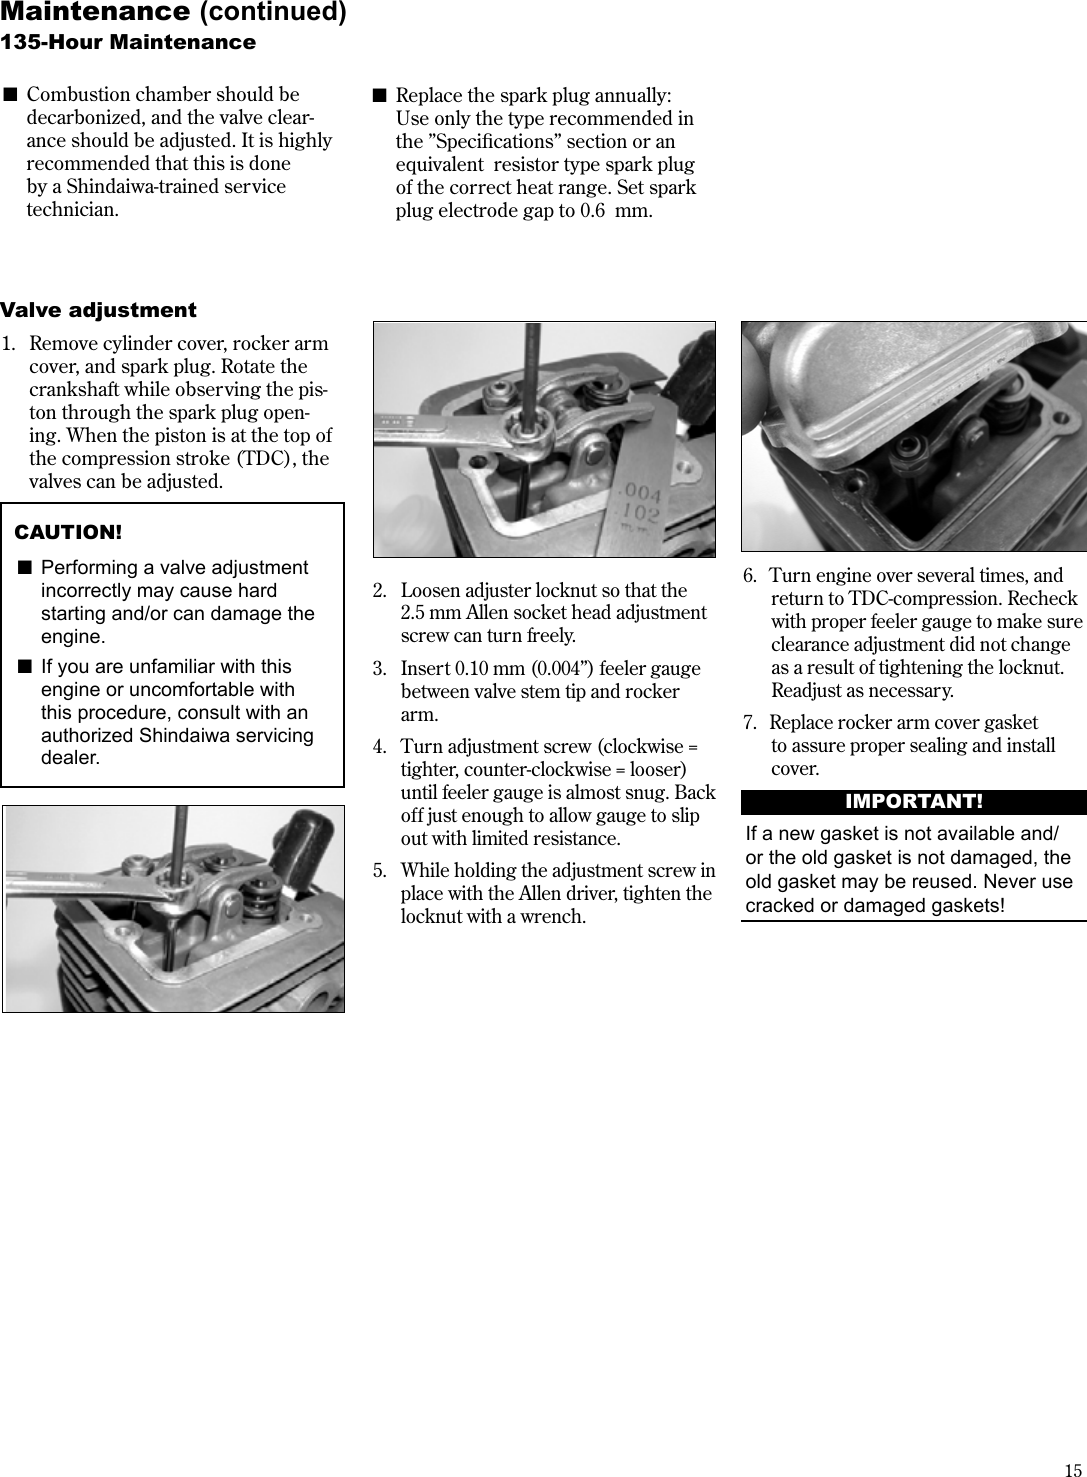 Shindaiwa M254 Users Manual